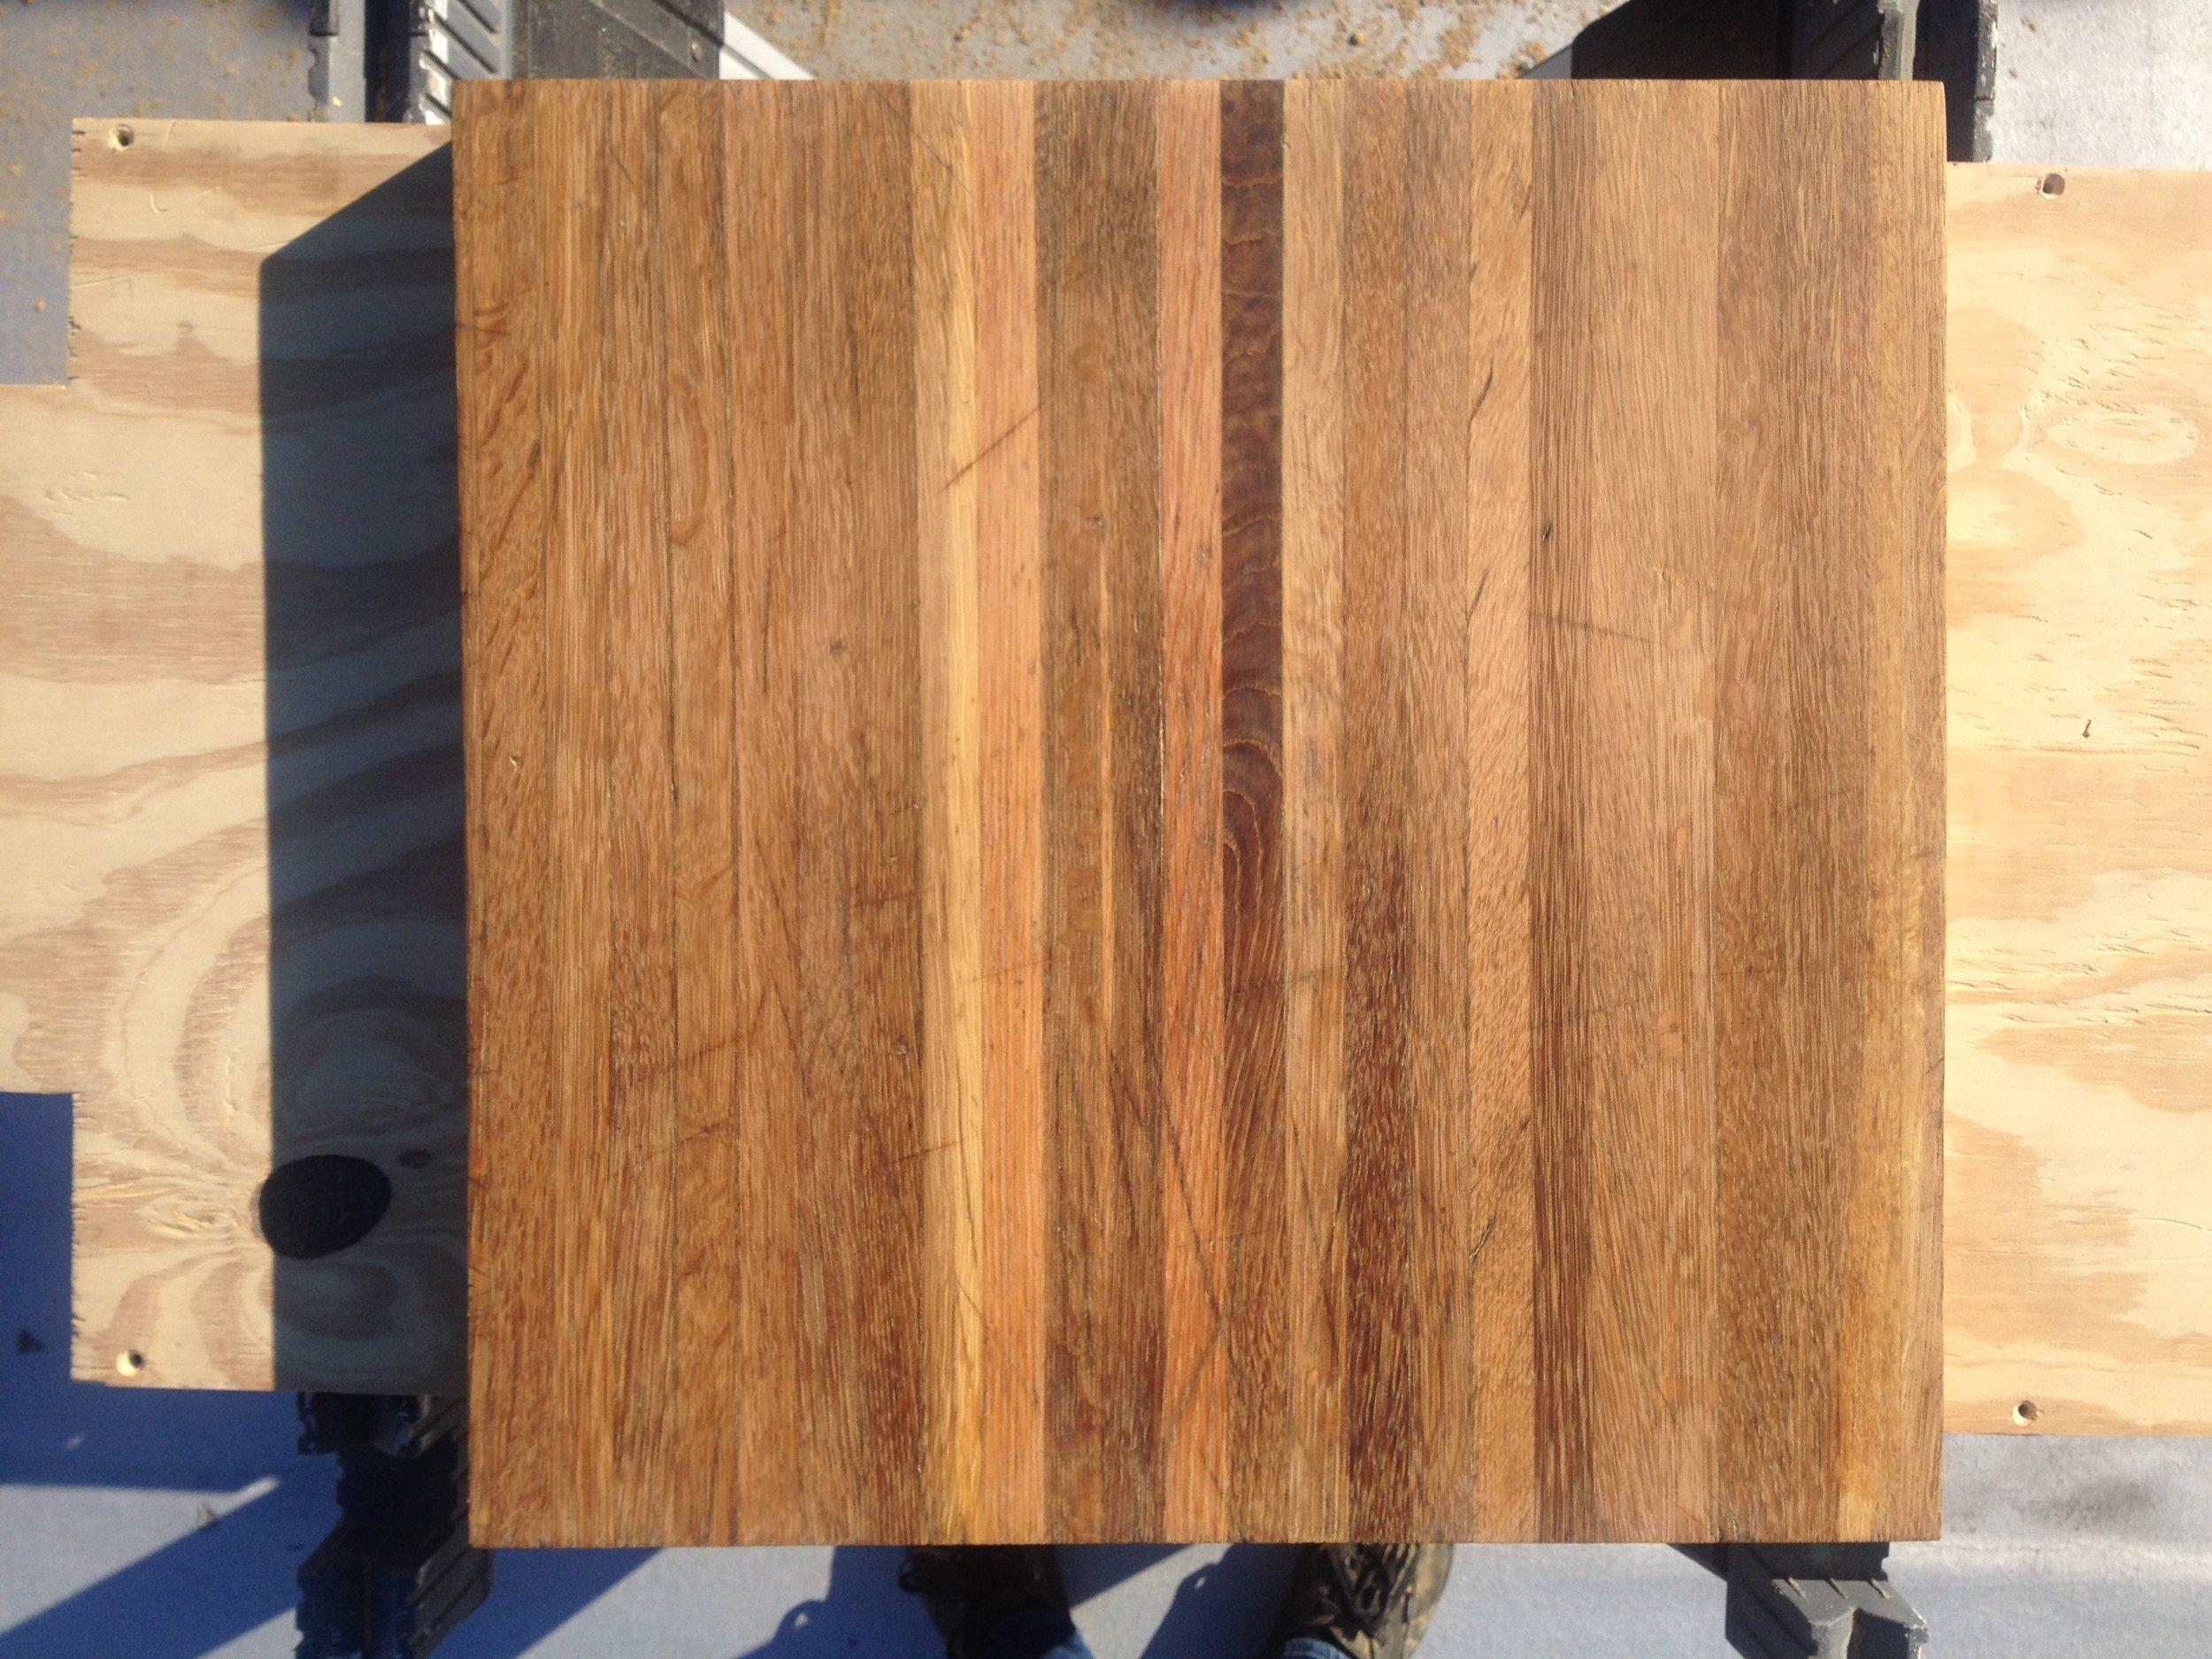 cutting-board-restoration-in-progress-8.jpg